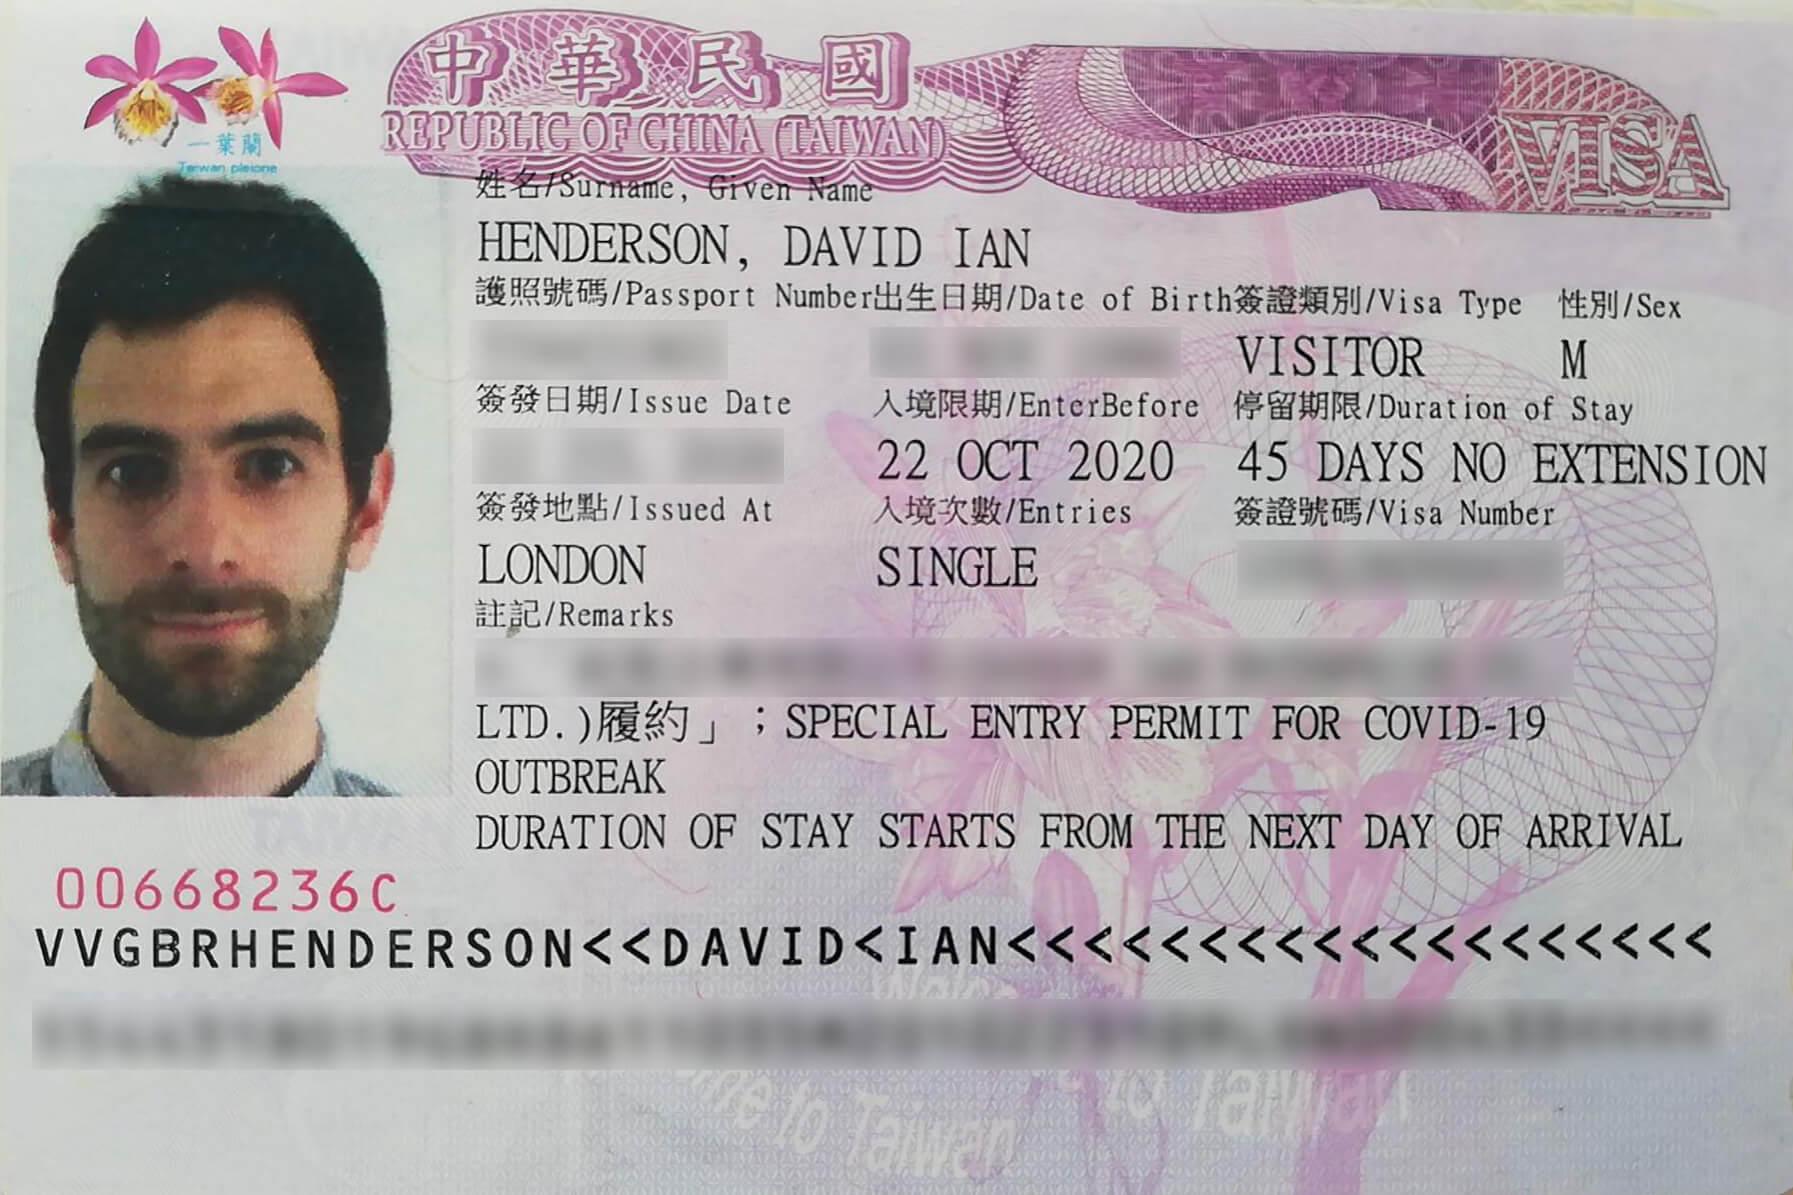 Dave's Taiwan visa